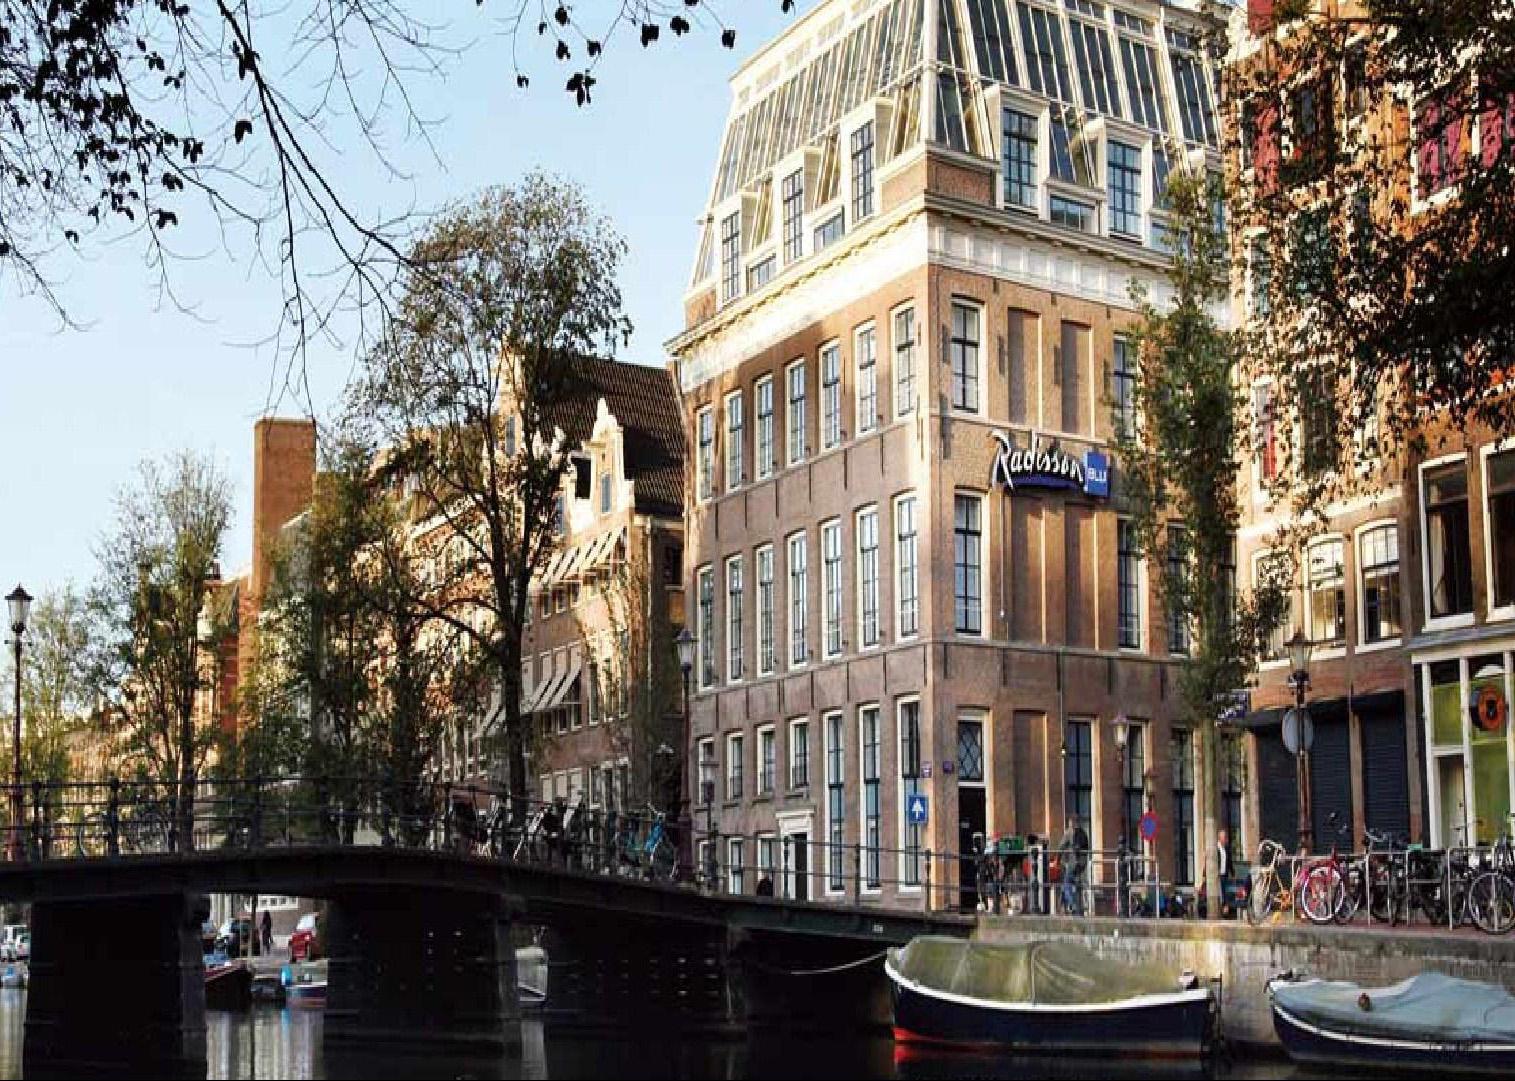 Radison Blu Amsterdam